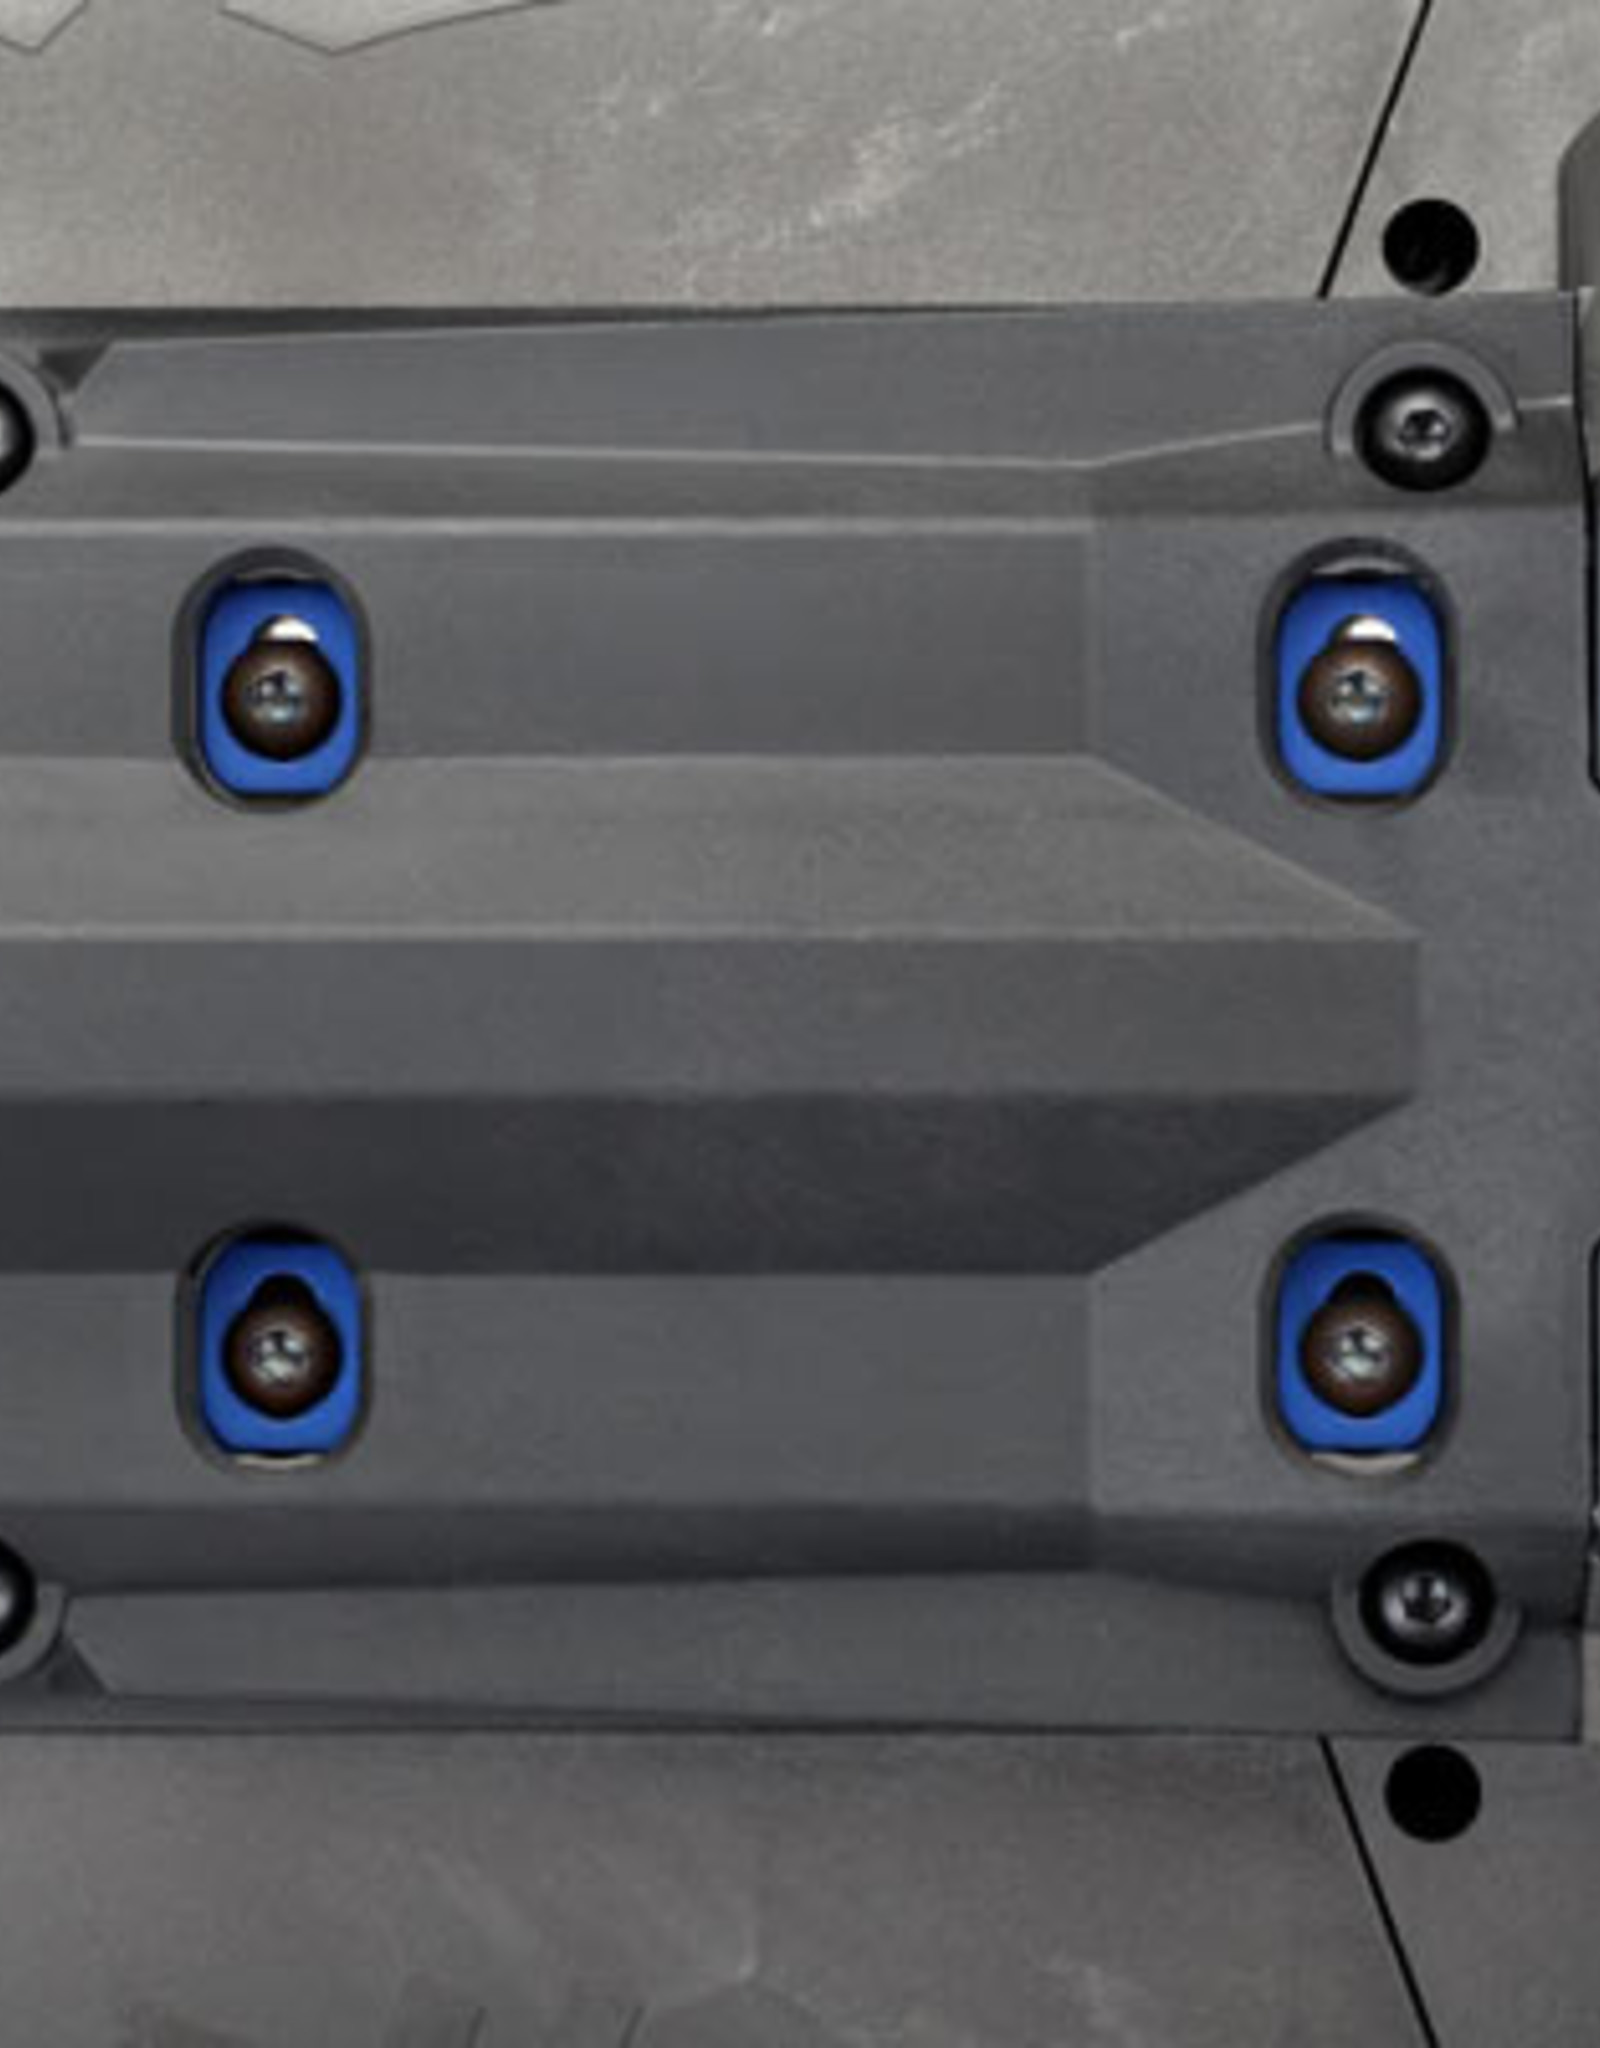 Traxxas Traxxas X-Maxx Washers, motor mount, aluminum (green-anodized) (4)/ 4x18mm BCS (4)